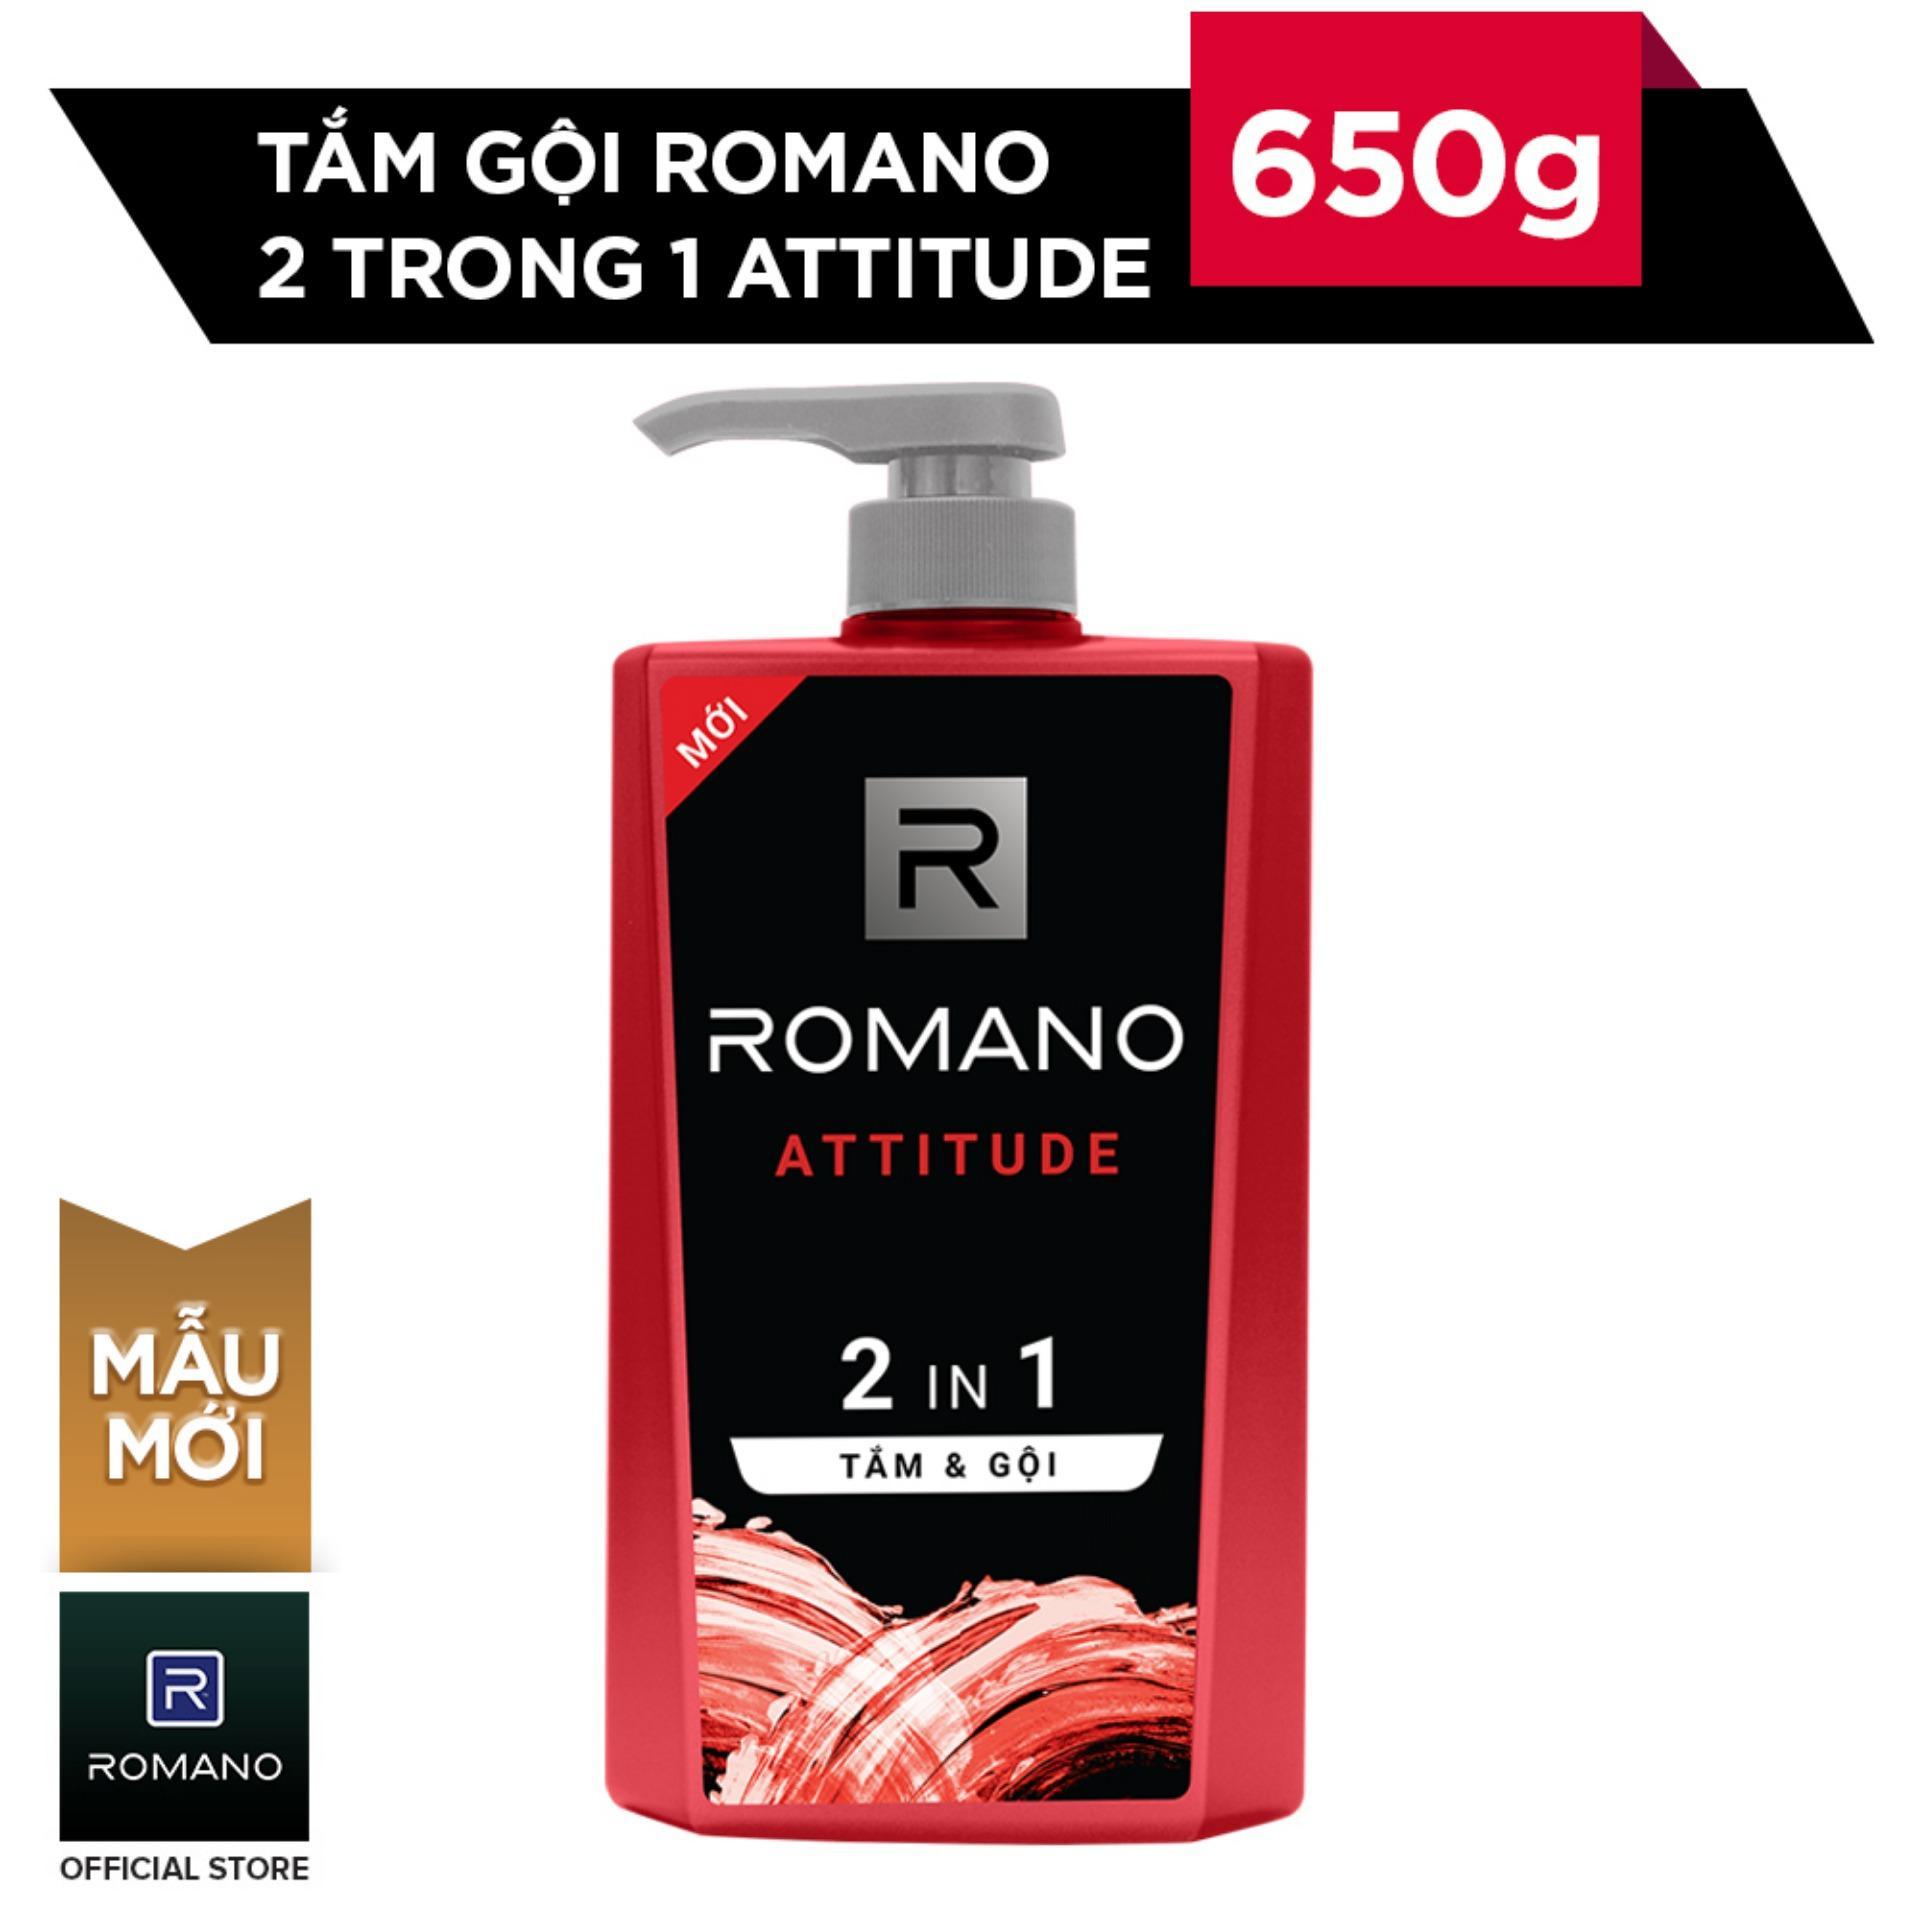 Romano Tắm gội 2 trong 1 Attitude 650g nhập khẩu